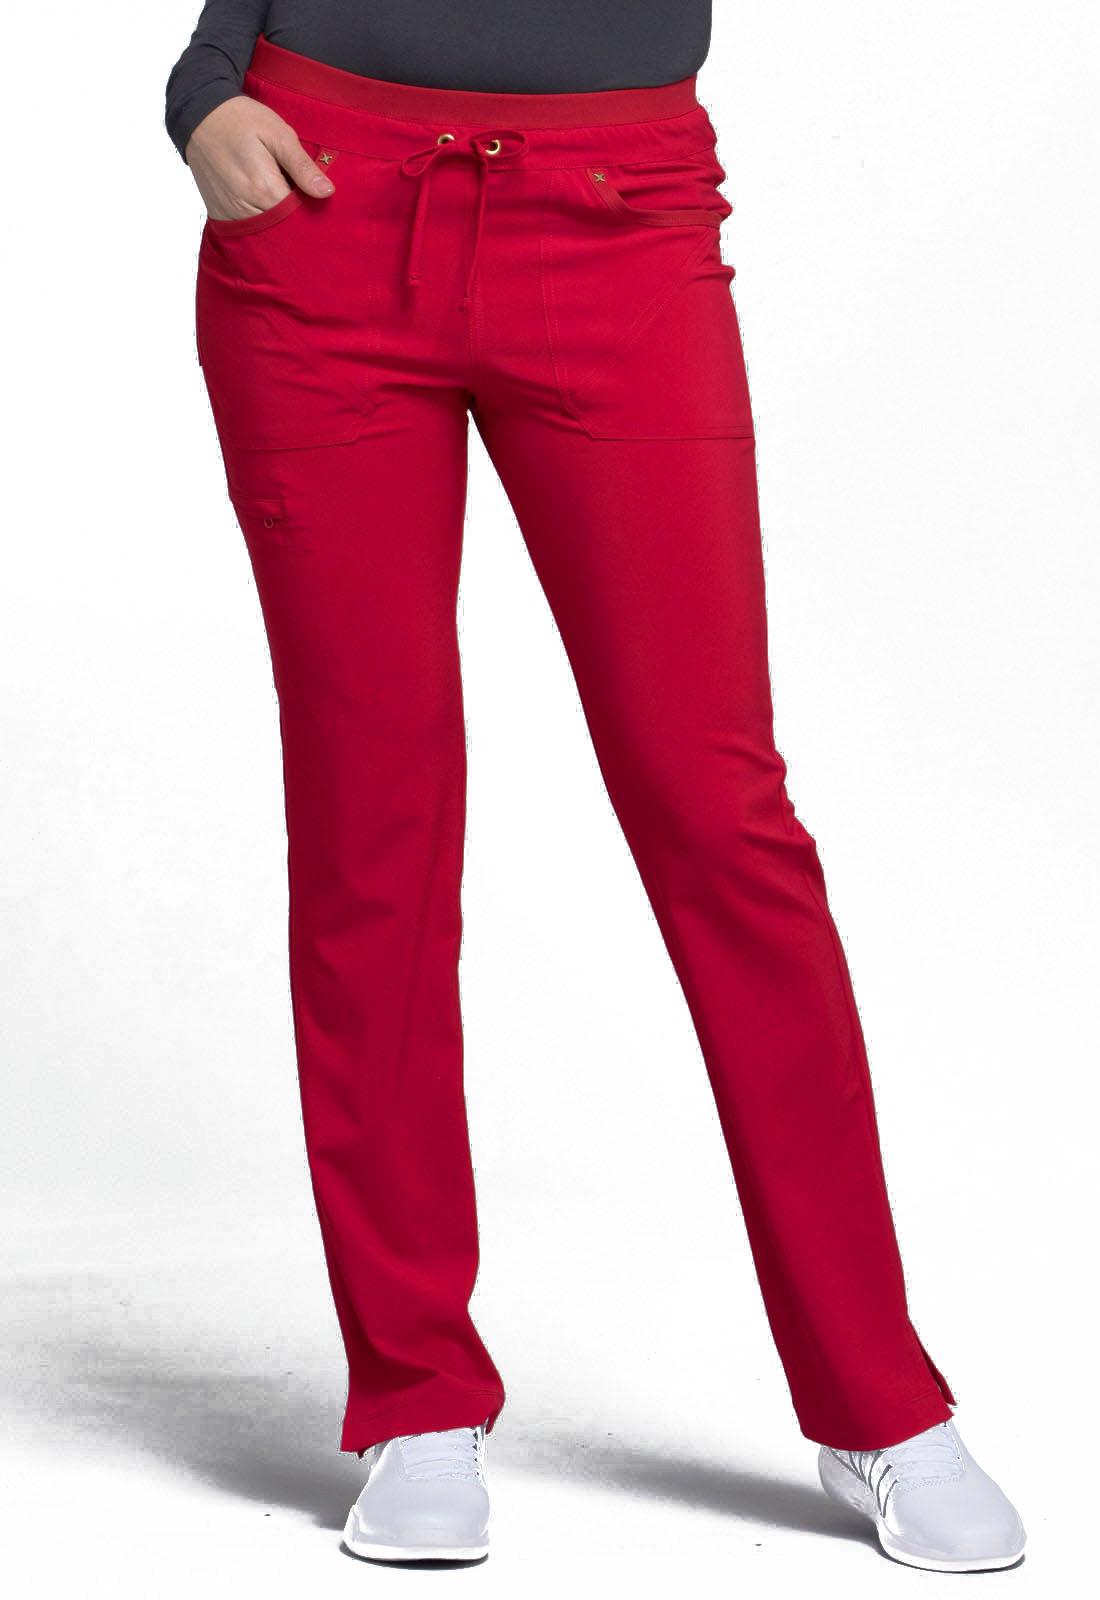 Mid Rise Tapered Leg Drawstring Pants CK010P